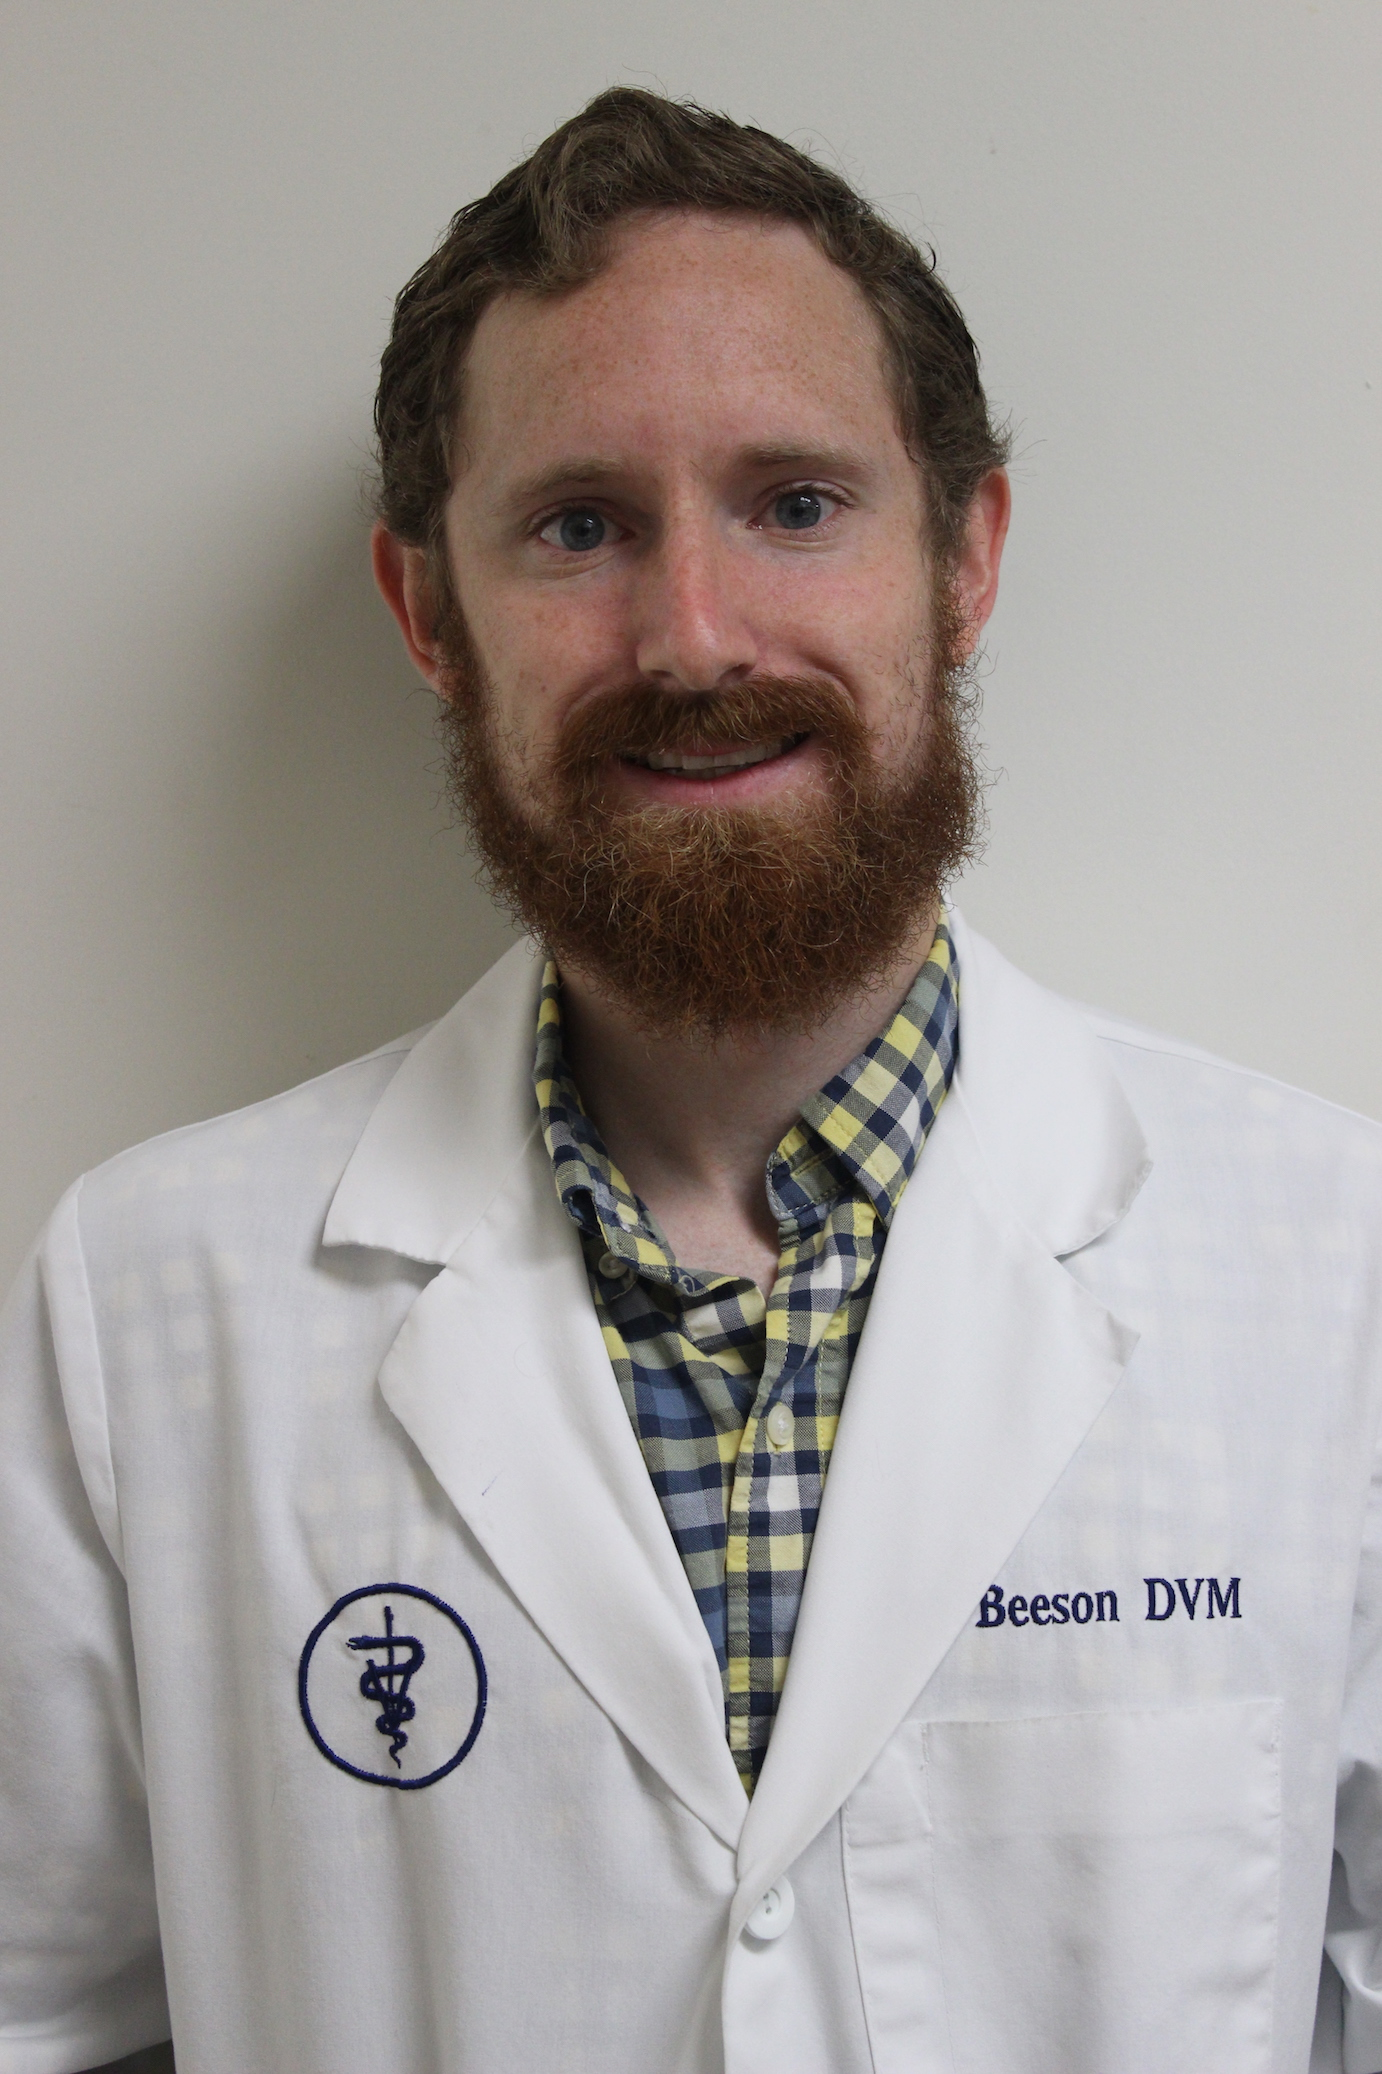 Dr. Mathew Beeson, DVM